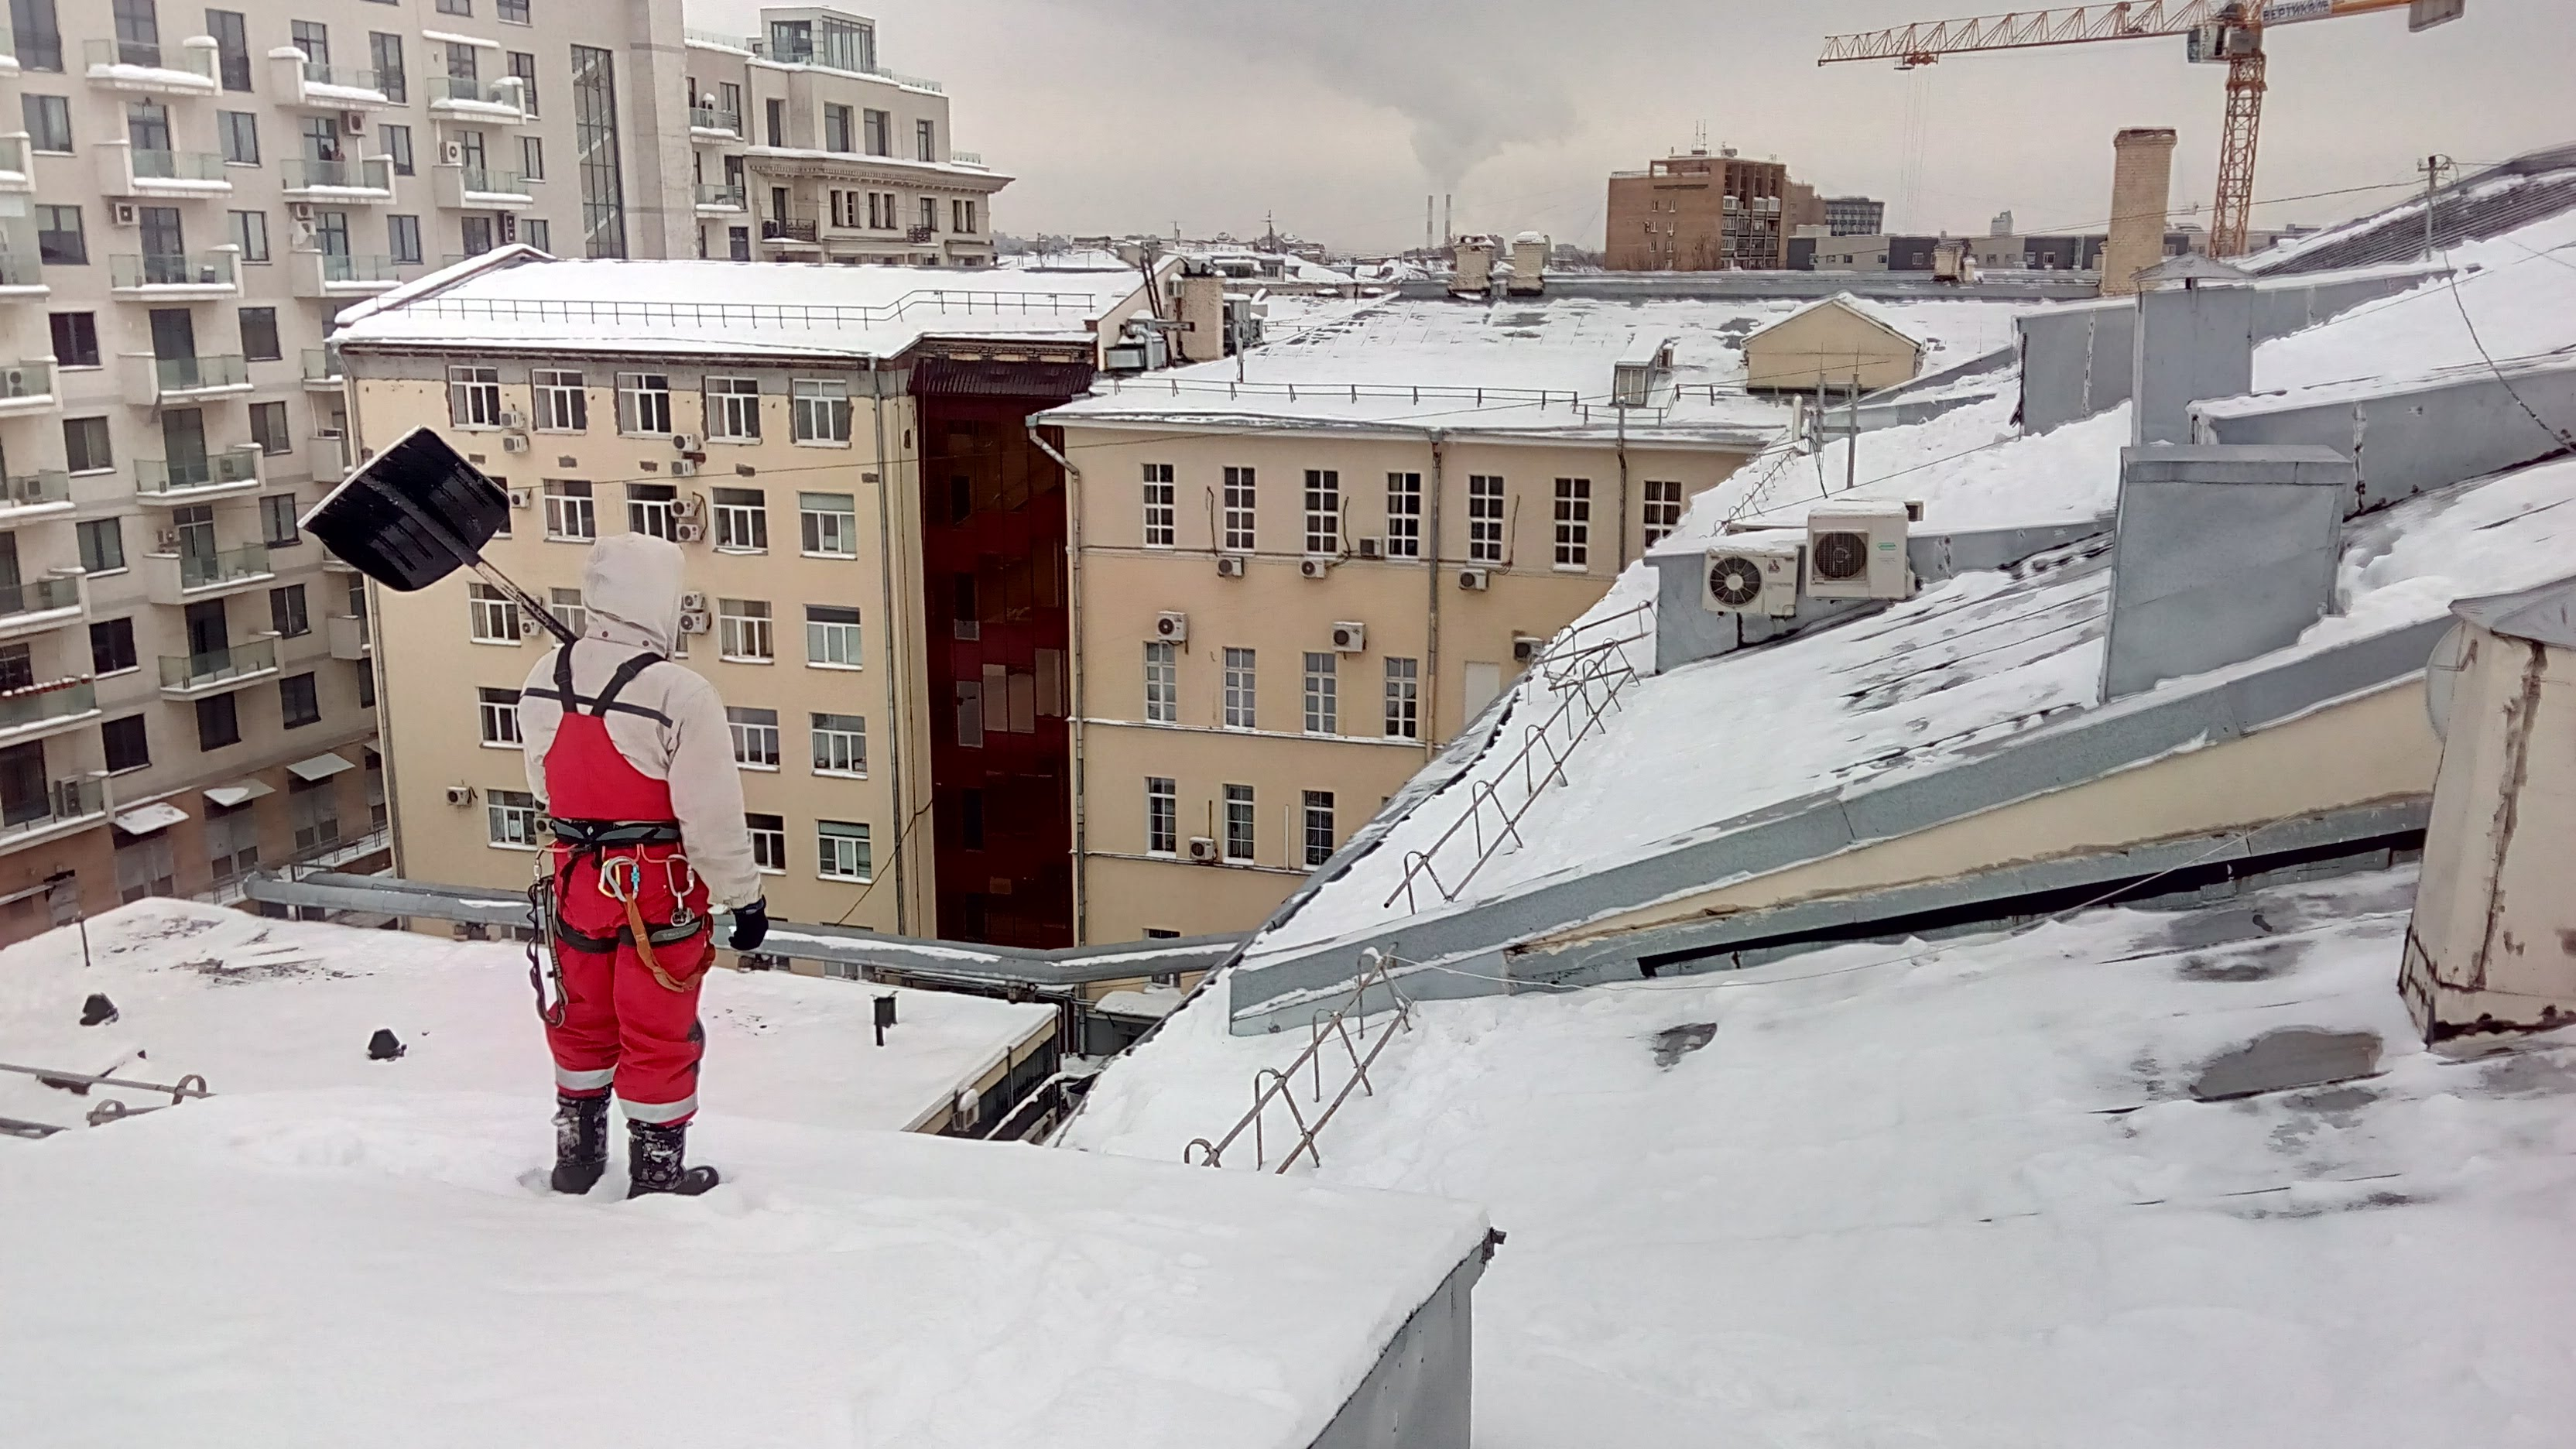 снег на крыше дома картинки когда